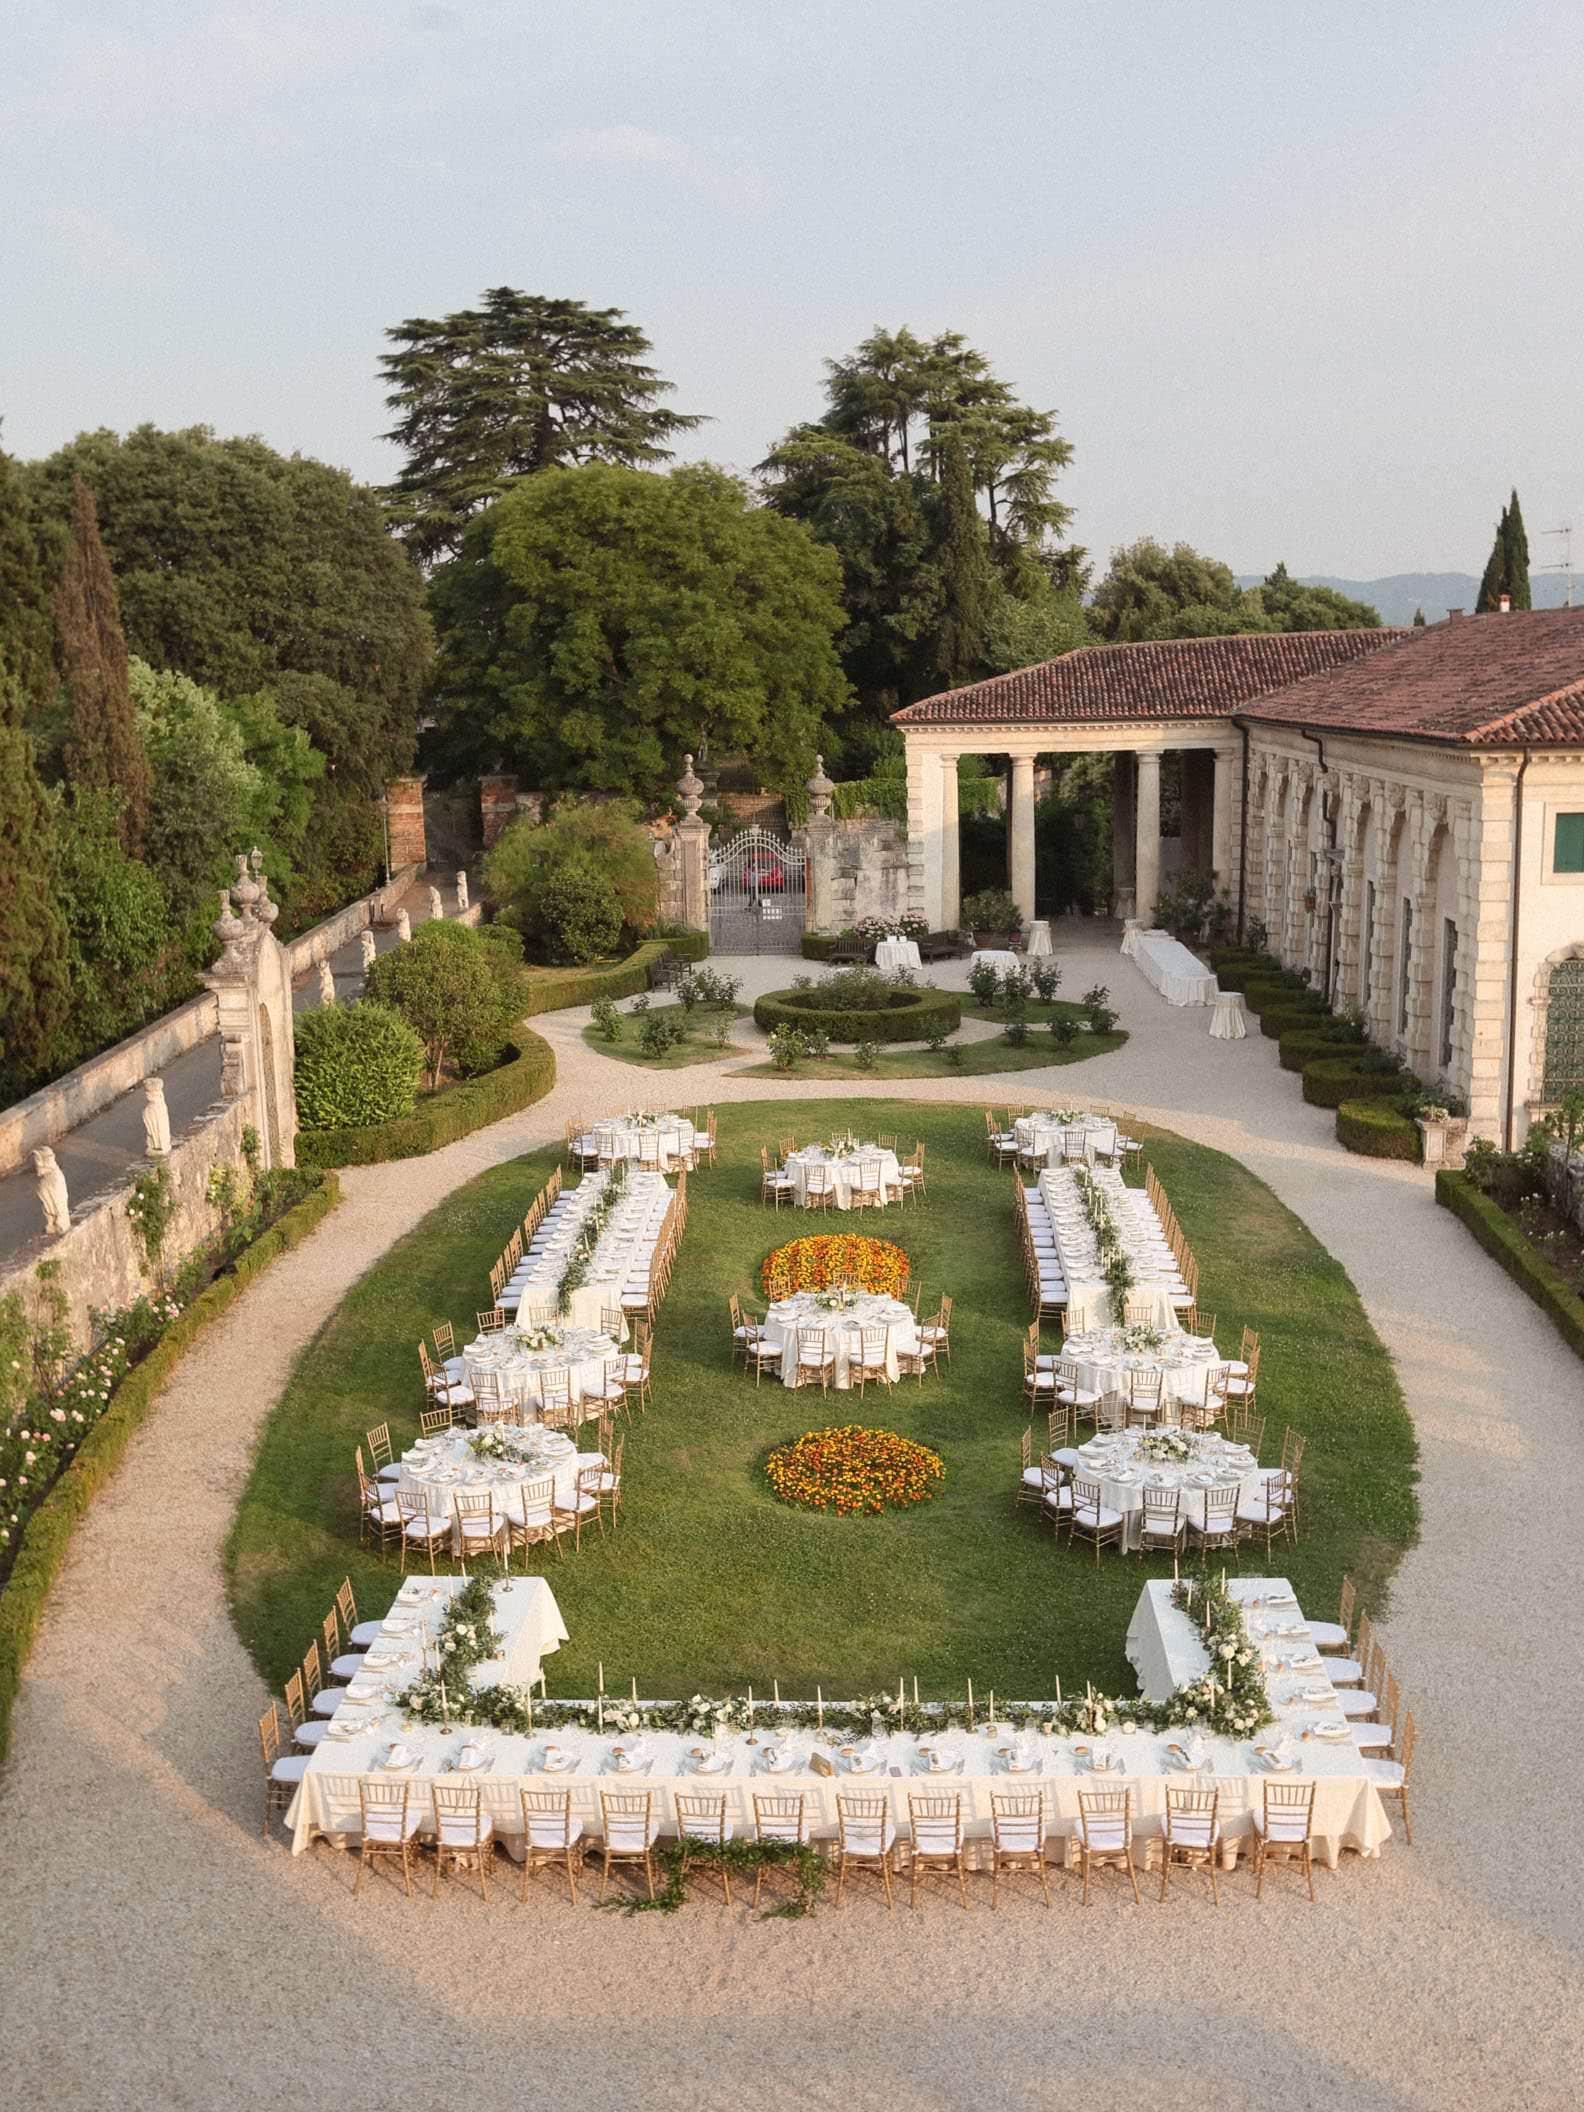 the garden of villa valmarana from above